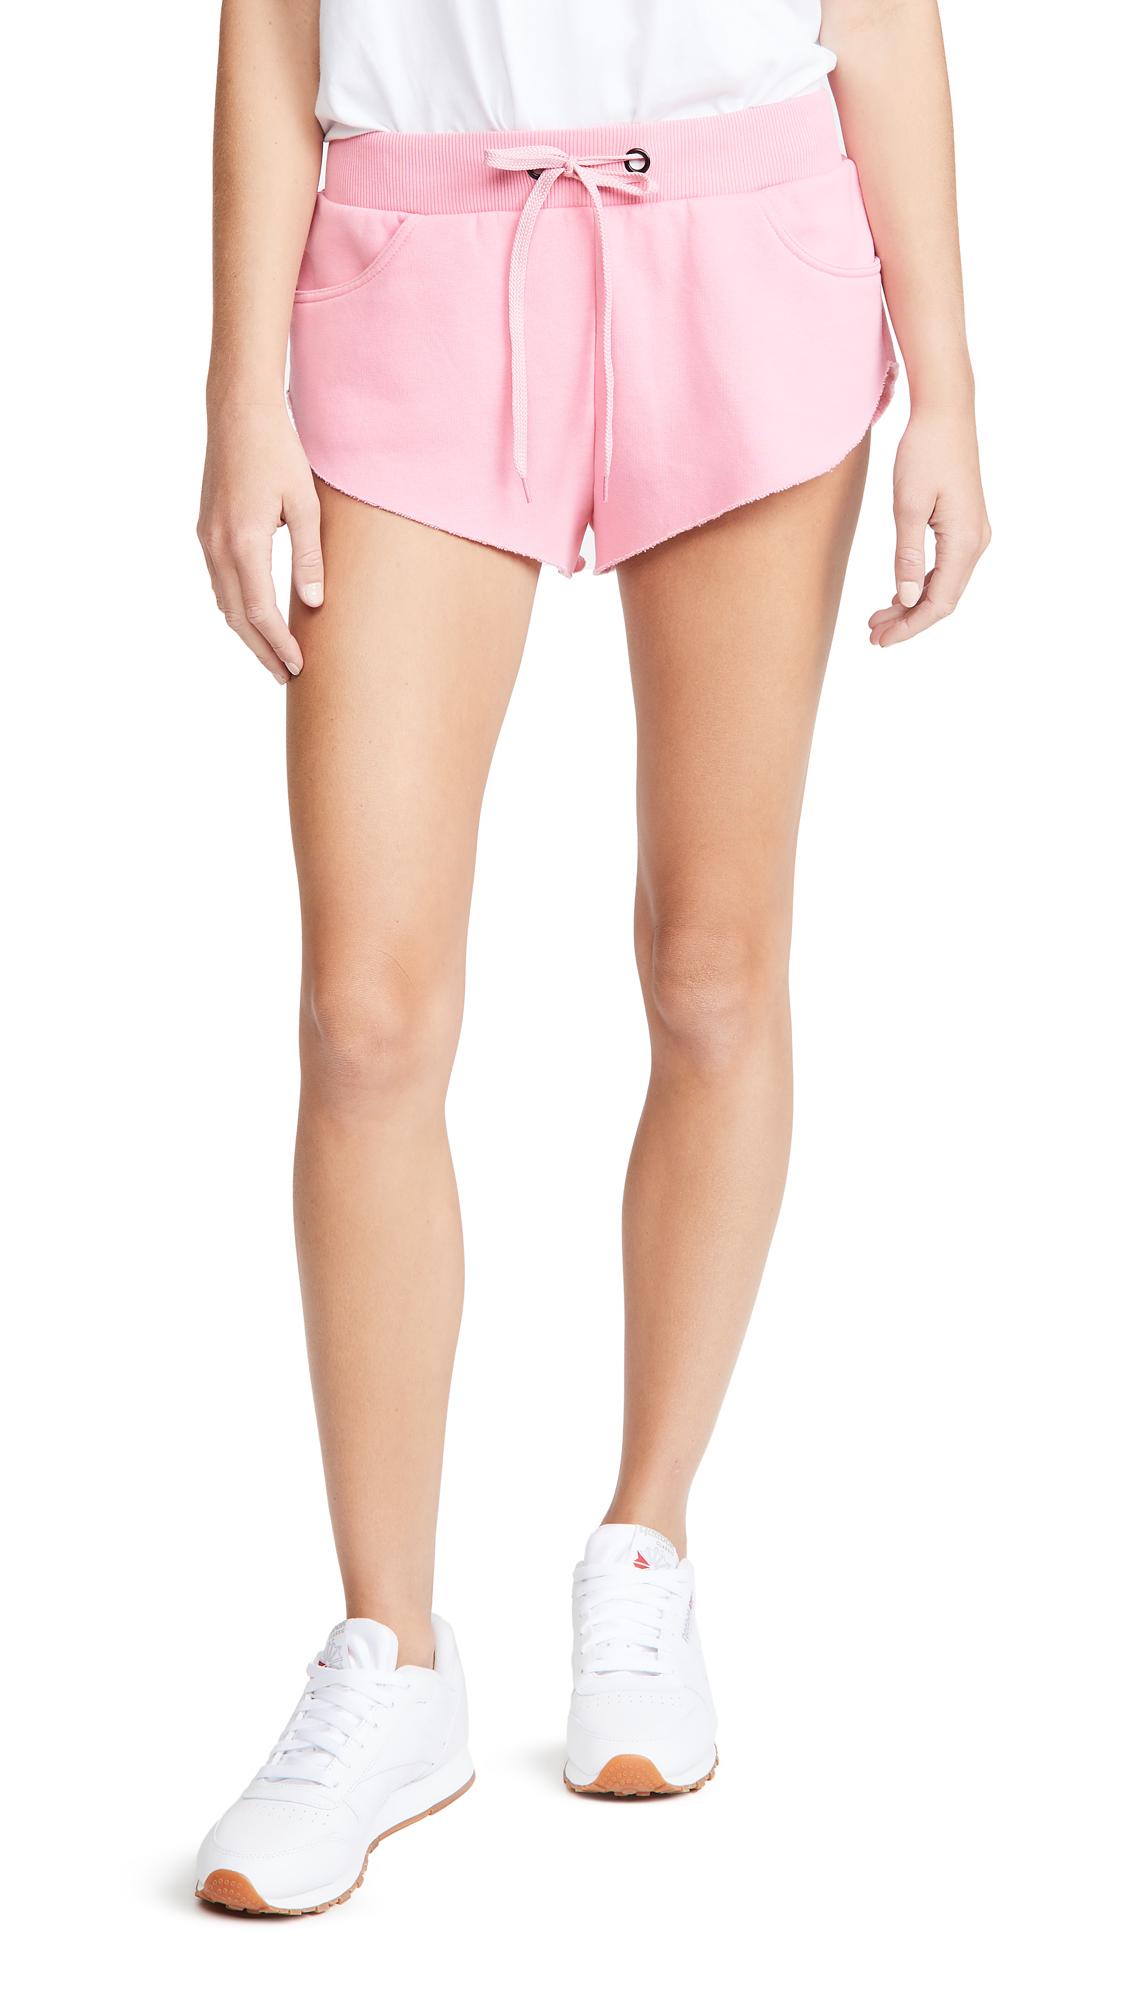 Natasha Zinko Jersey Jogging Embroidered Shorts